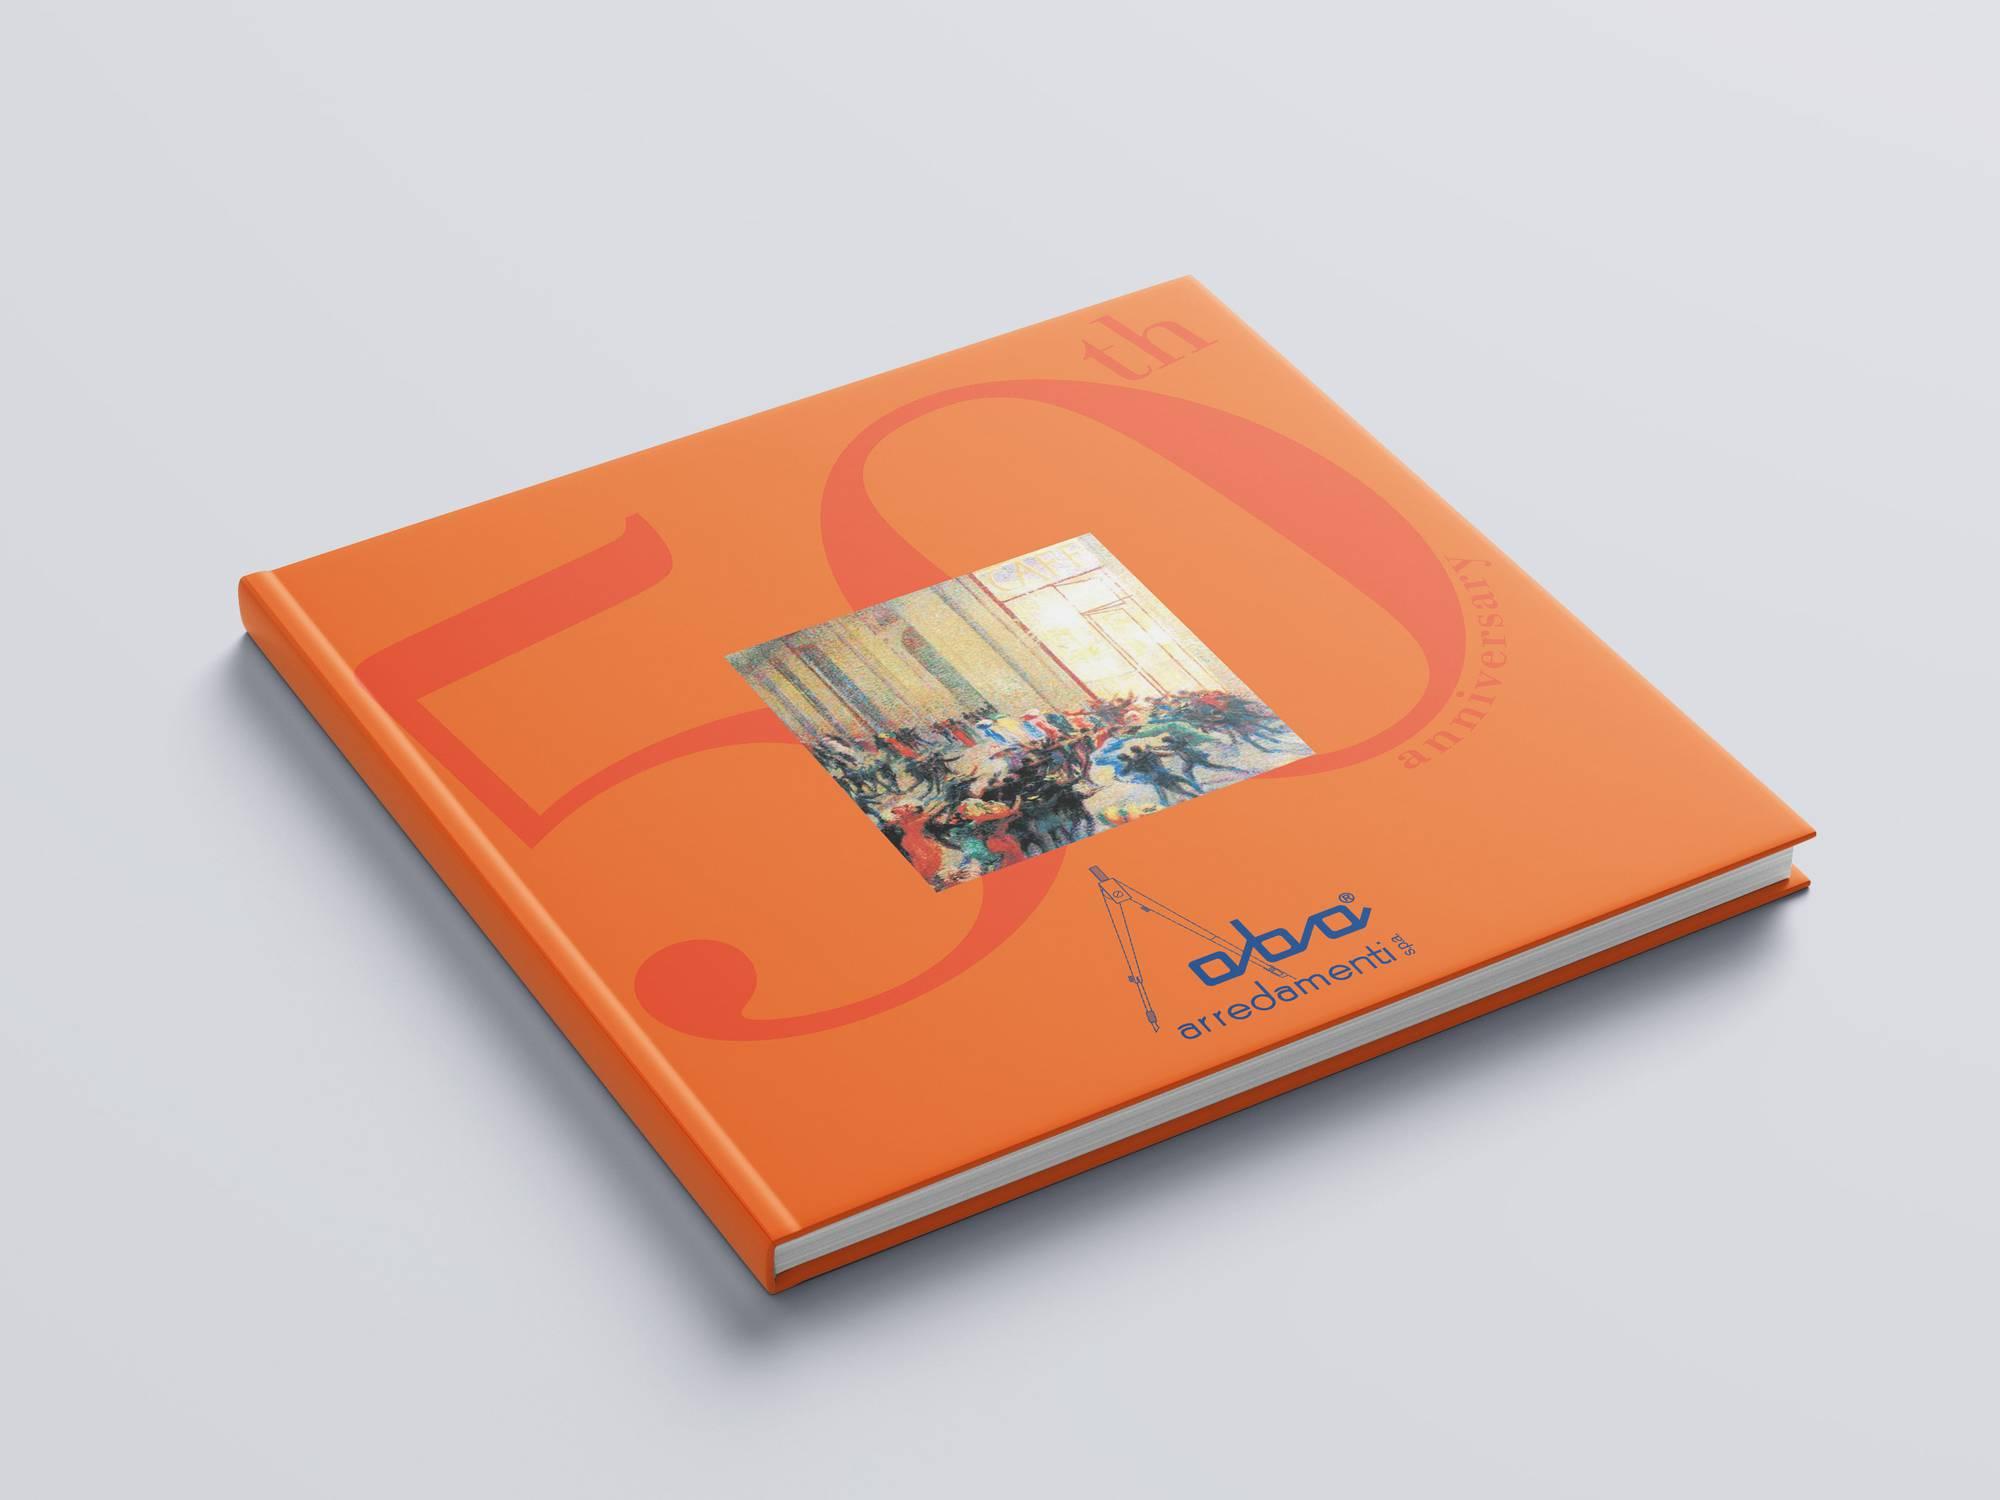 Book-ed-3.jpg